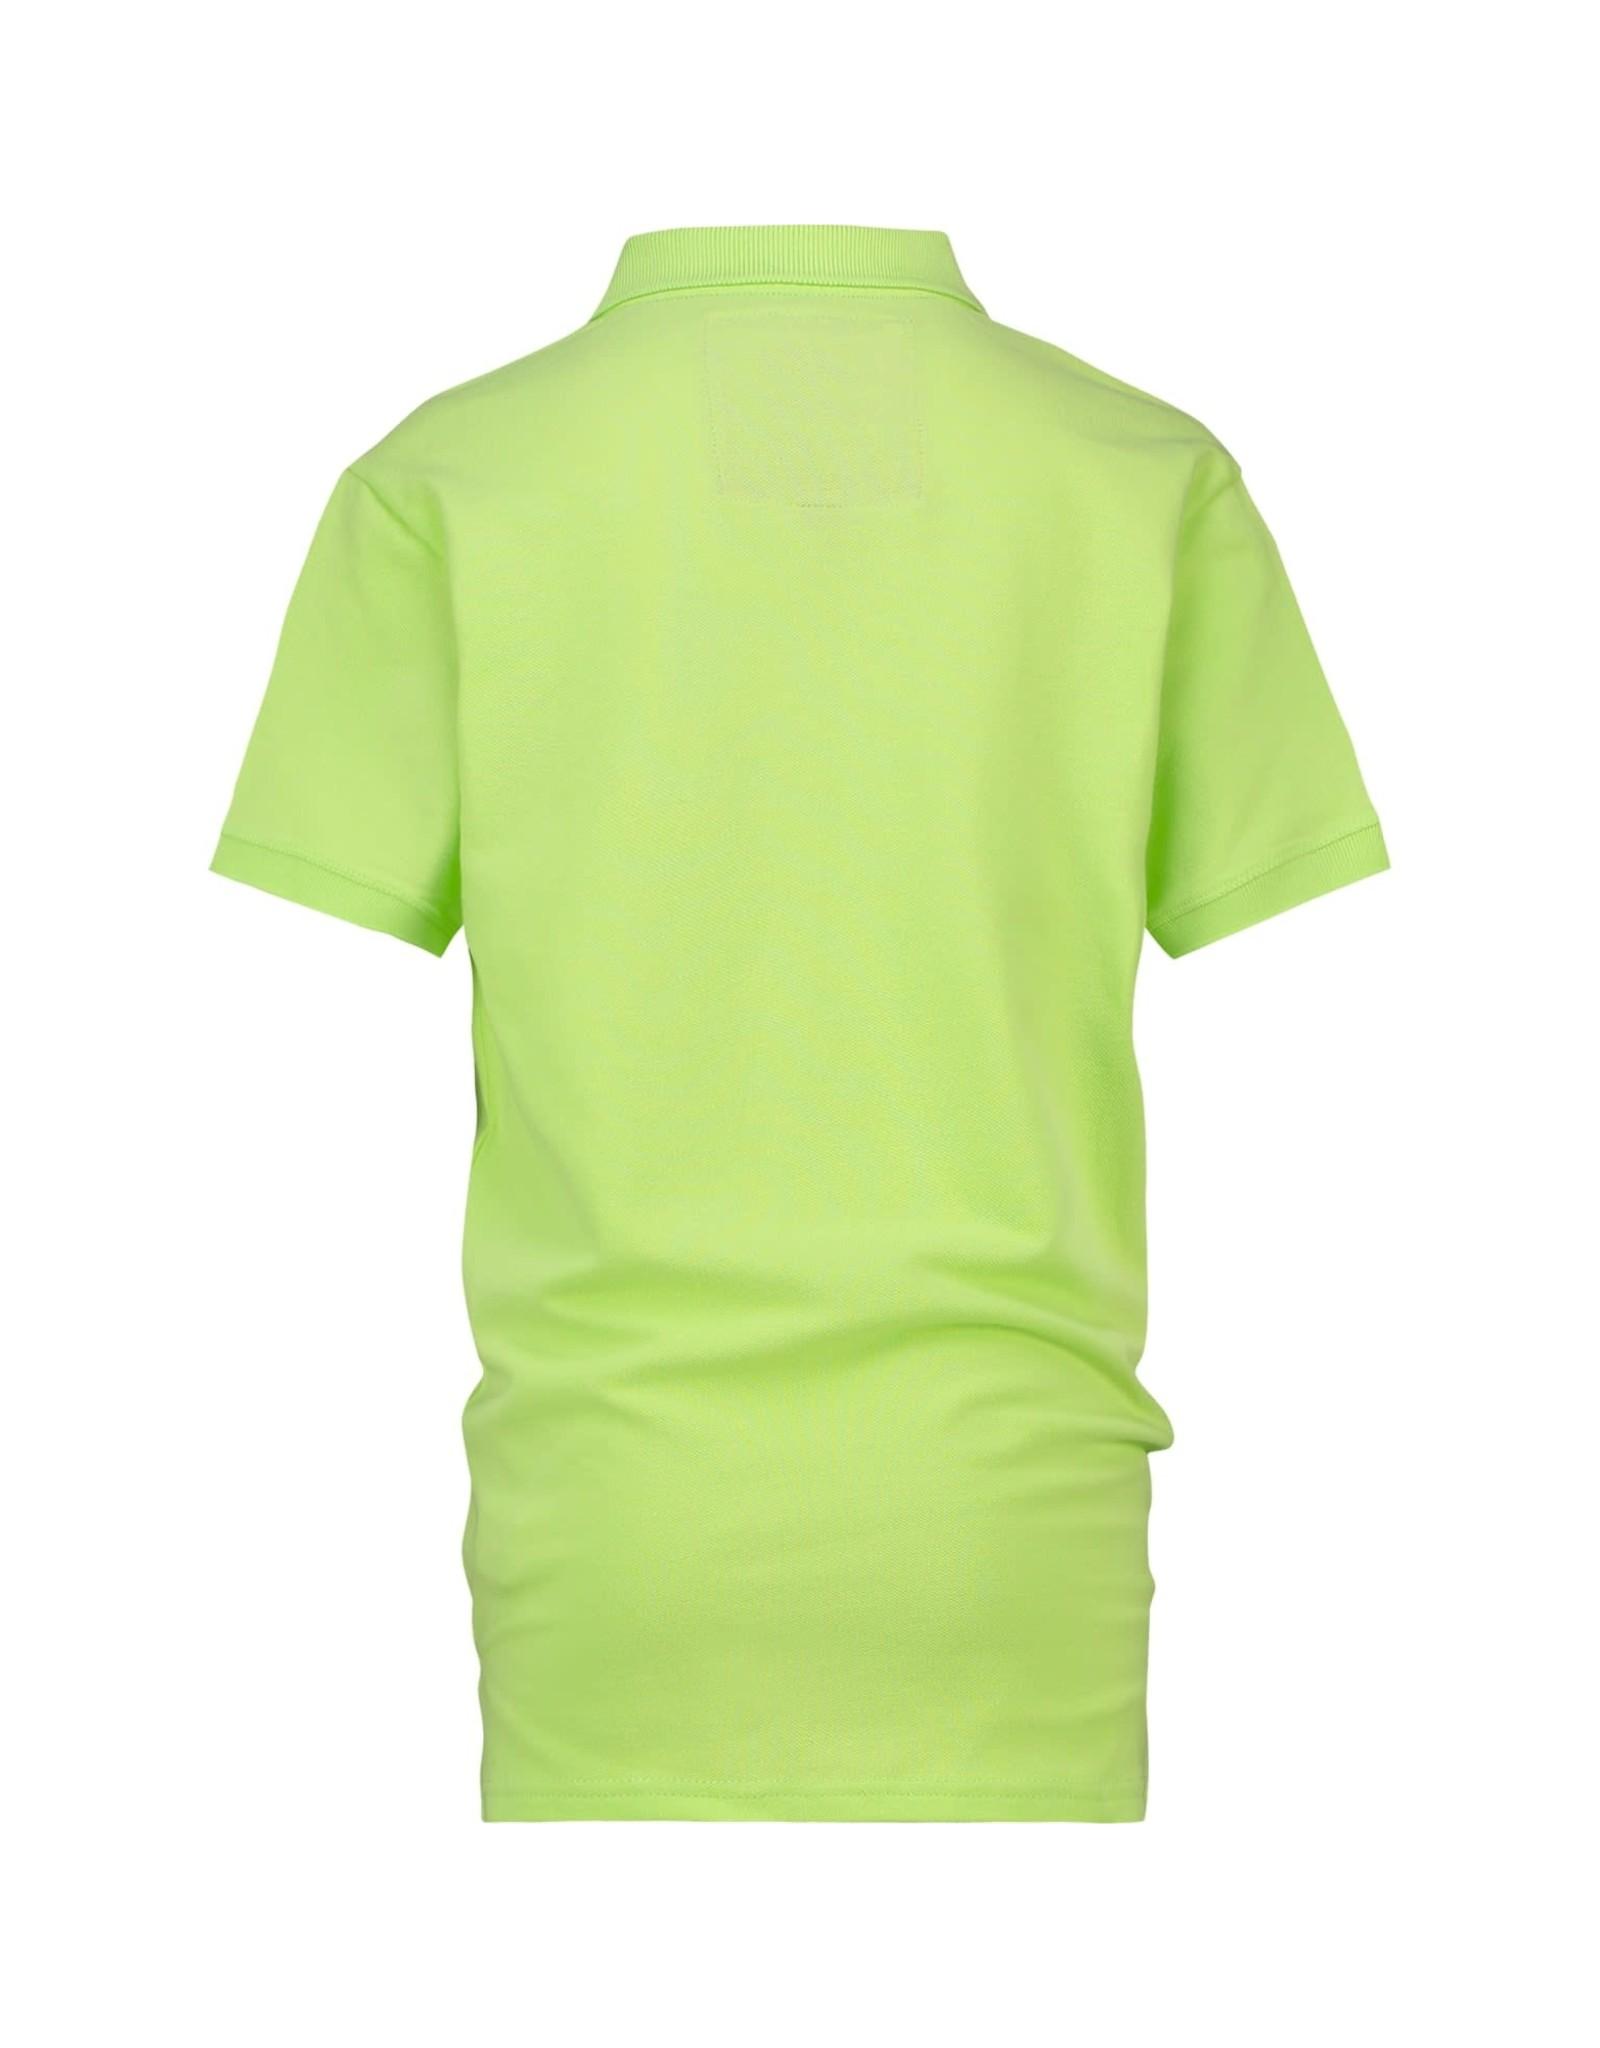 Vingino Vingino jongens polo t-shirt Karoen